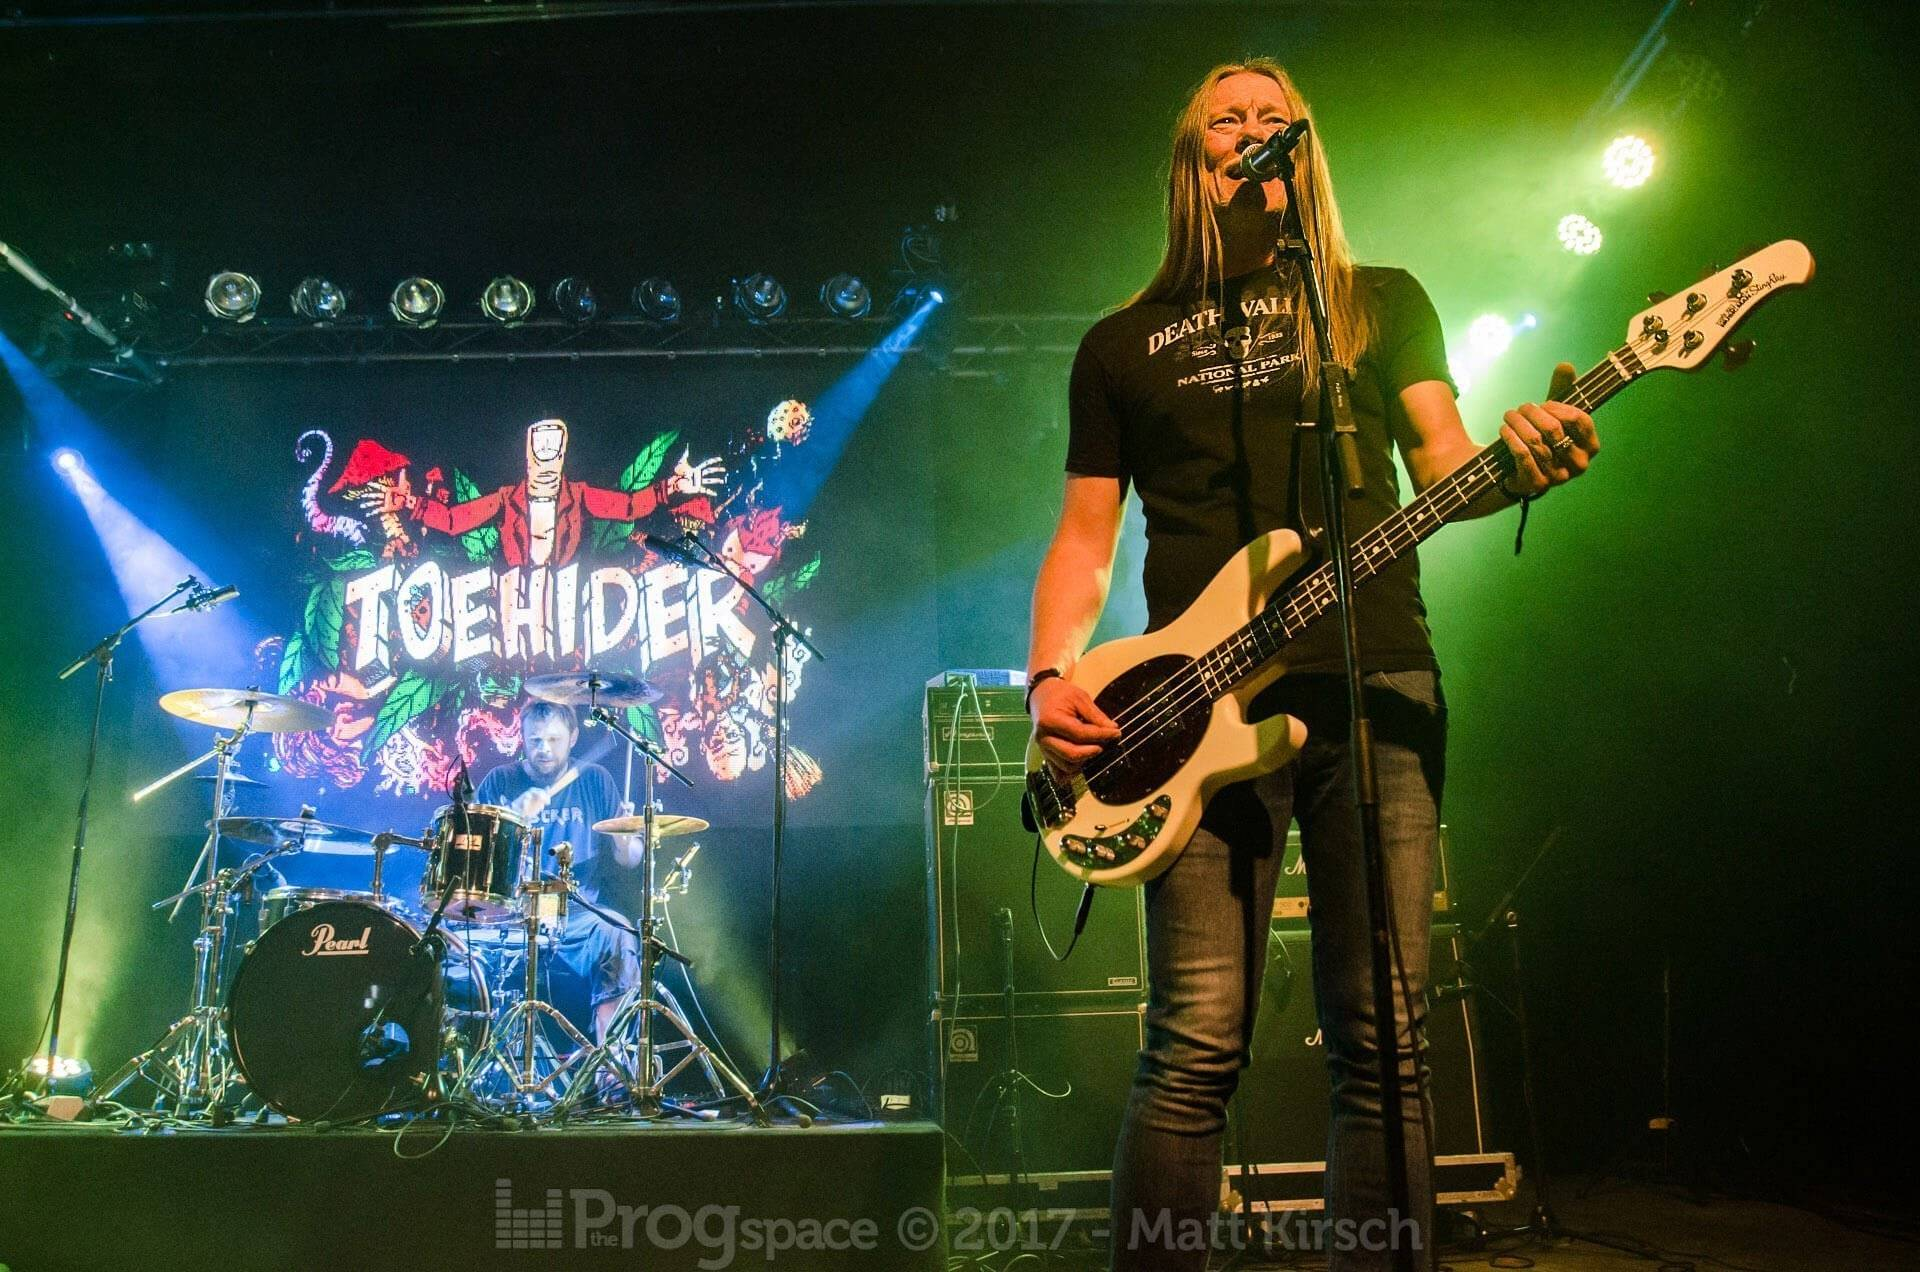 14-Toehider-ProgpowerEurope2017-07